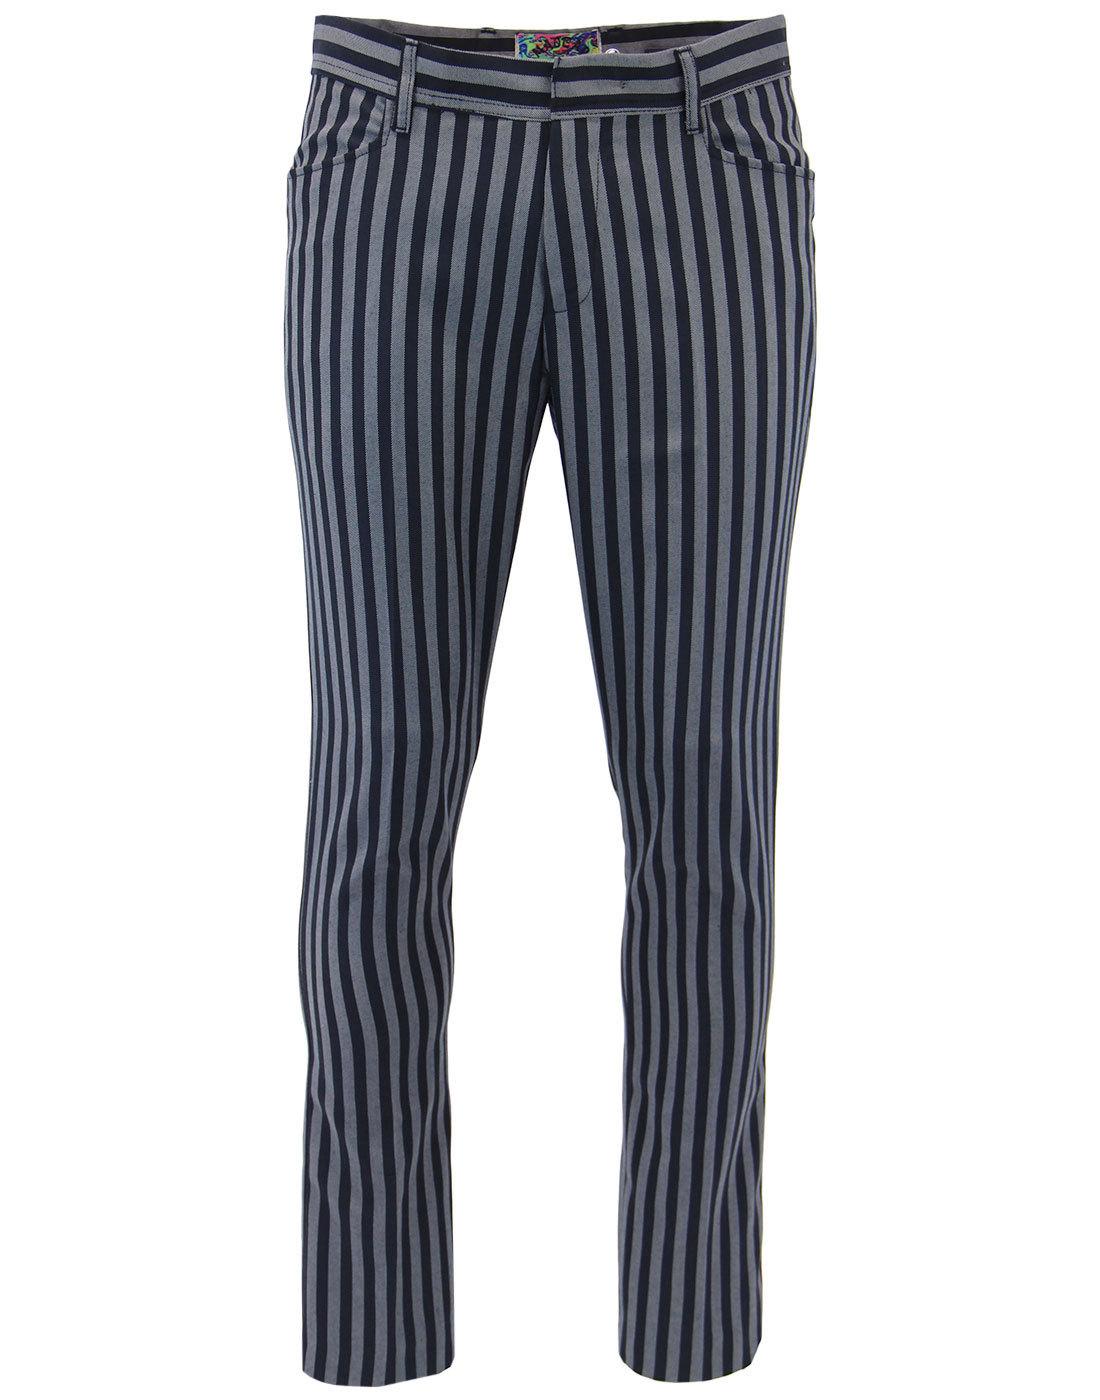 madcap england meadon 60s mod stripe trousers navy